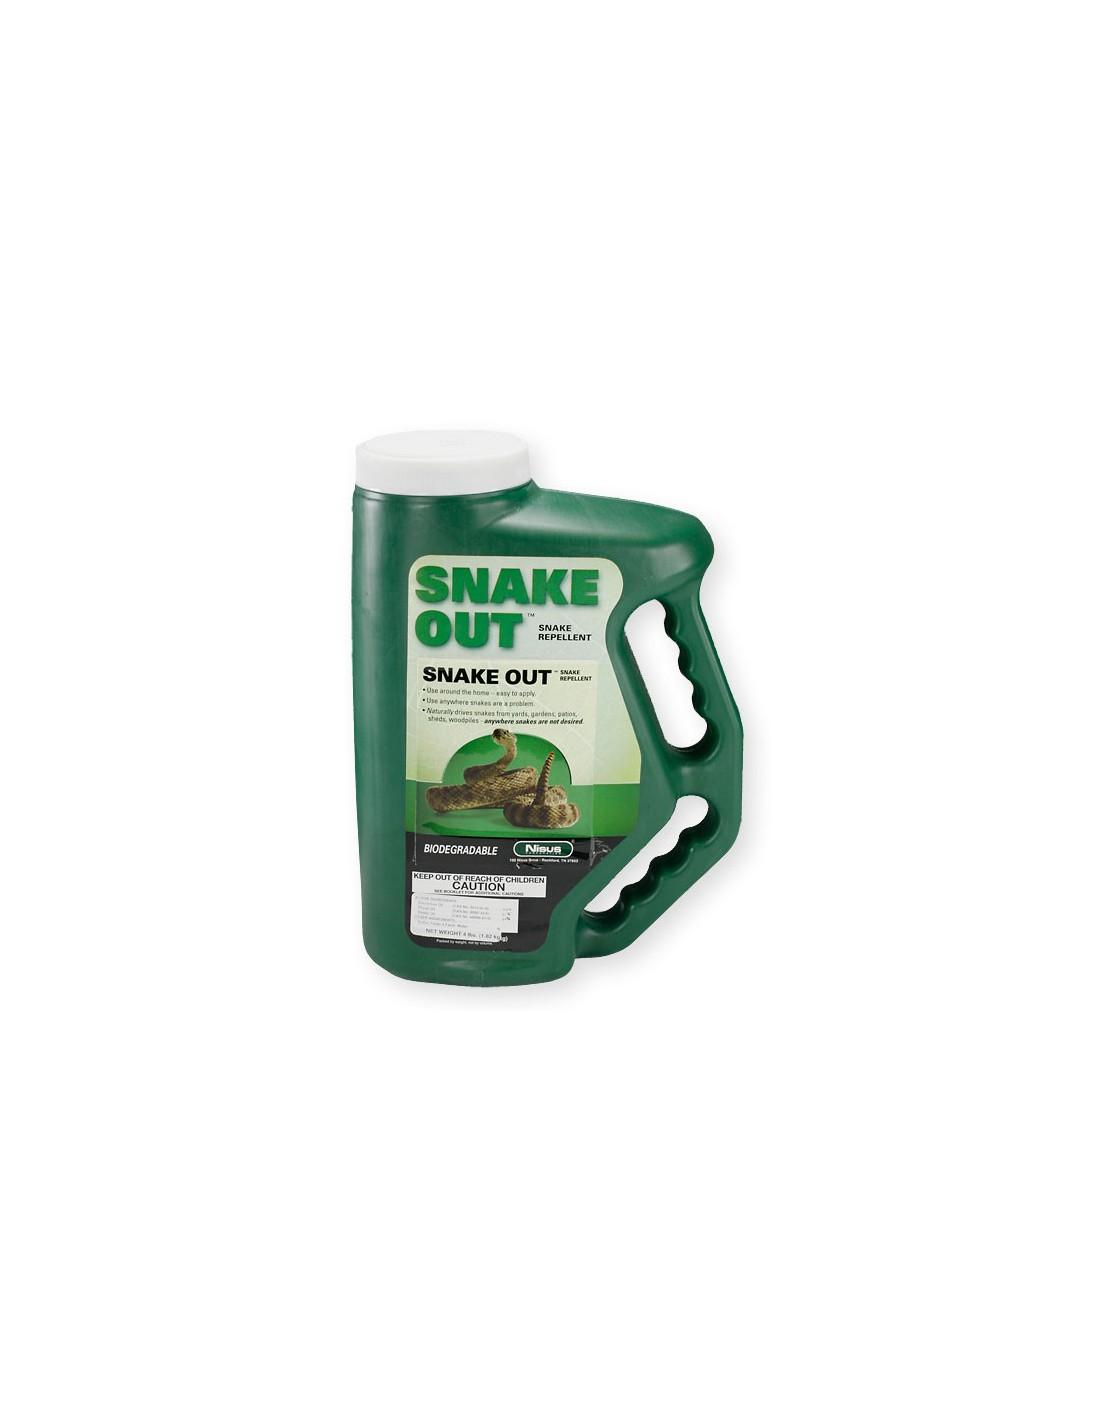 will it work for tree lizards / geckos